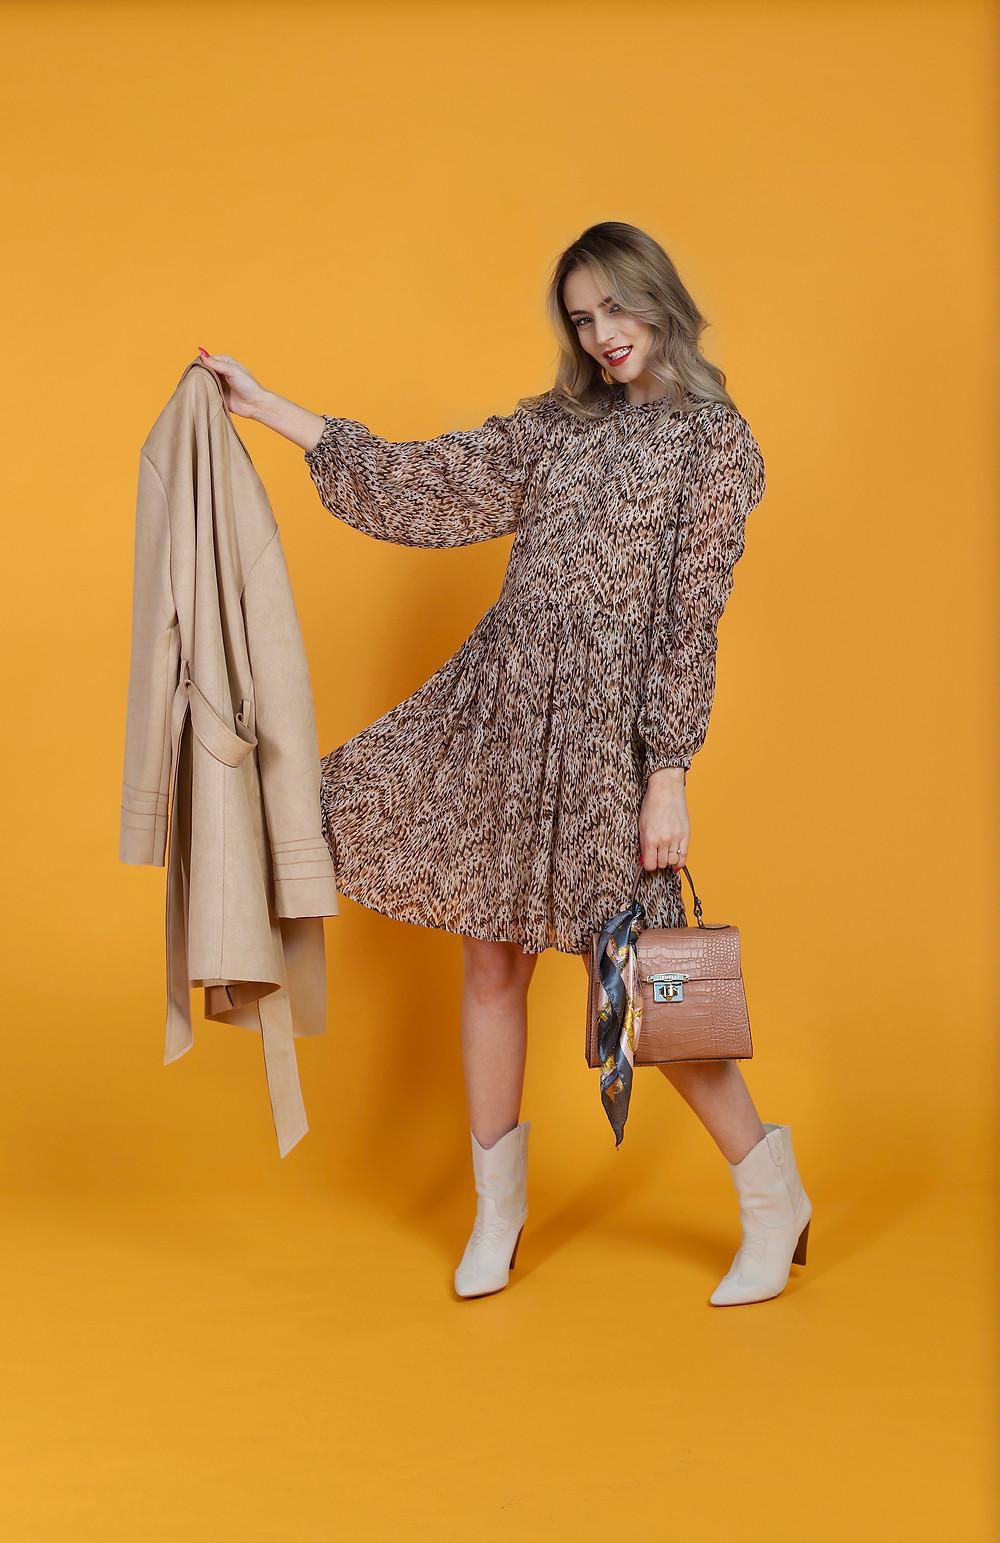 beige-outfit-inspo.jpg